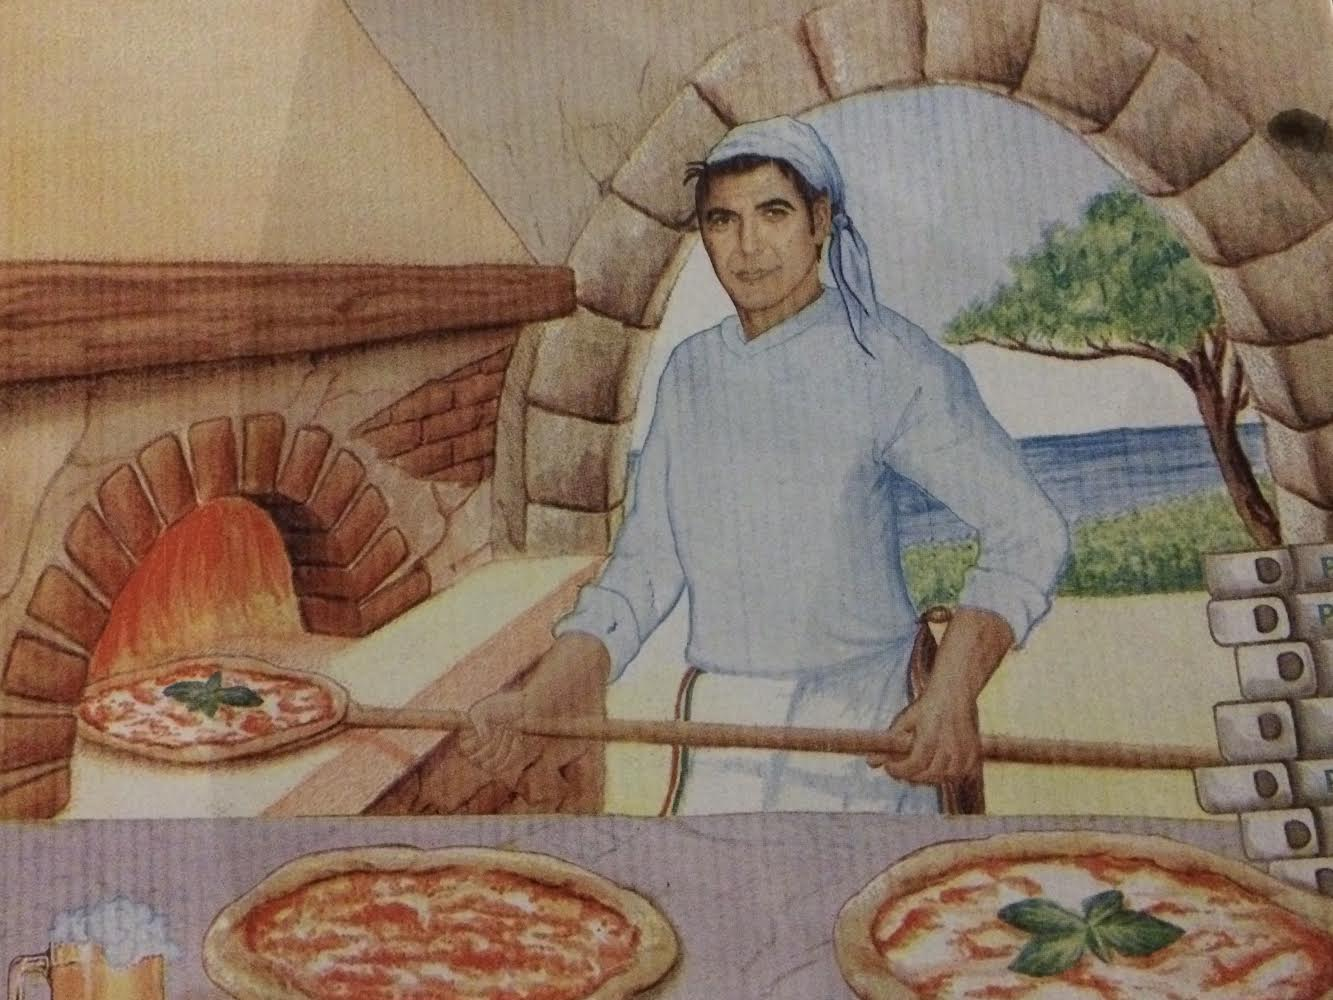 Clooney Pizza box_Nice.jpg